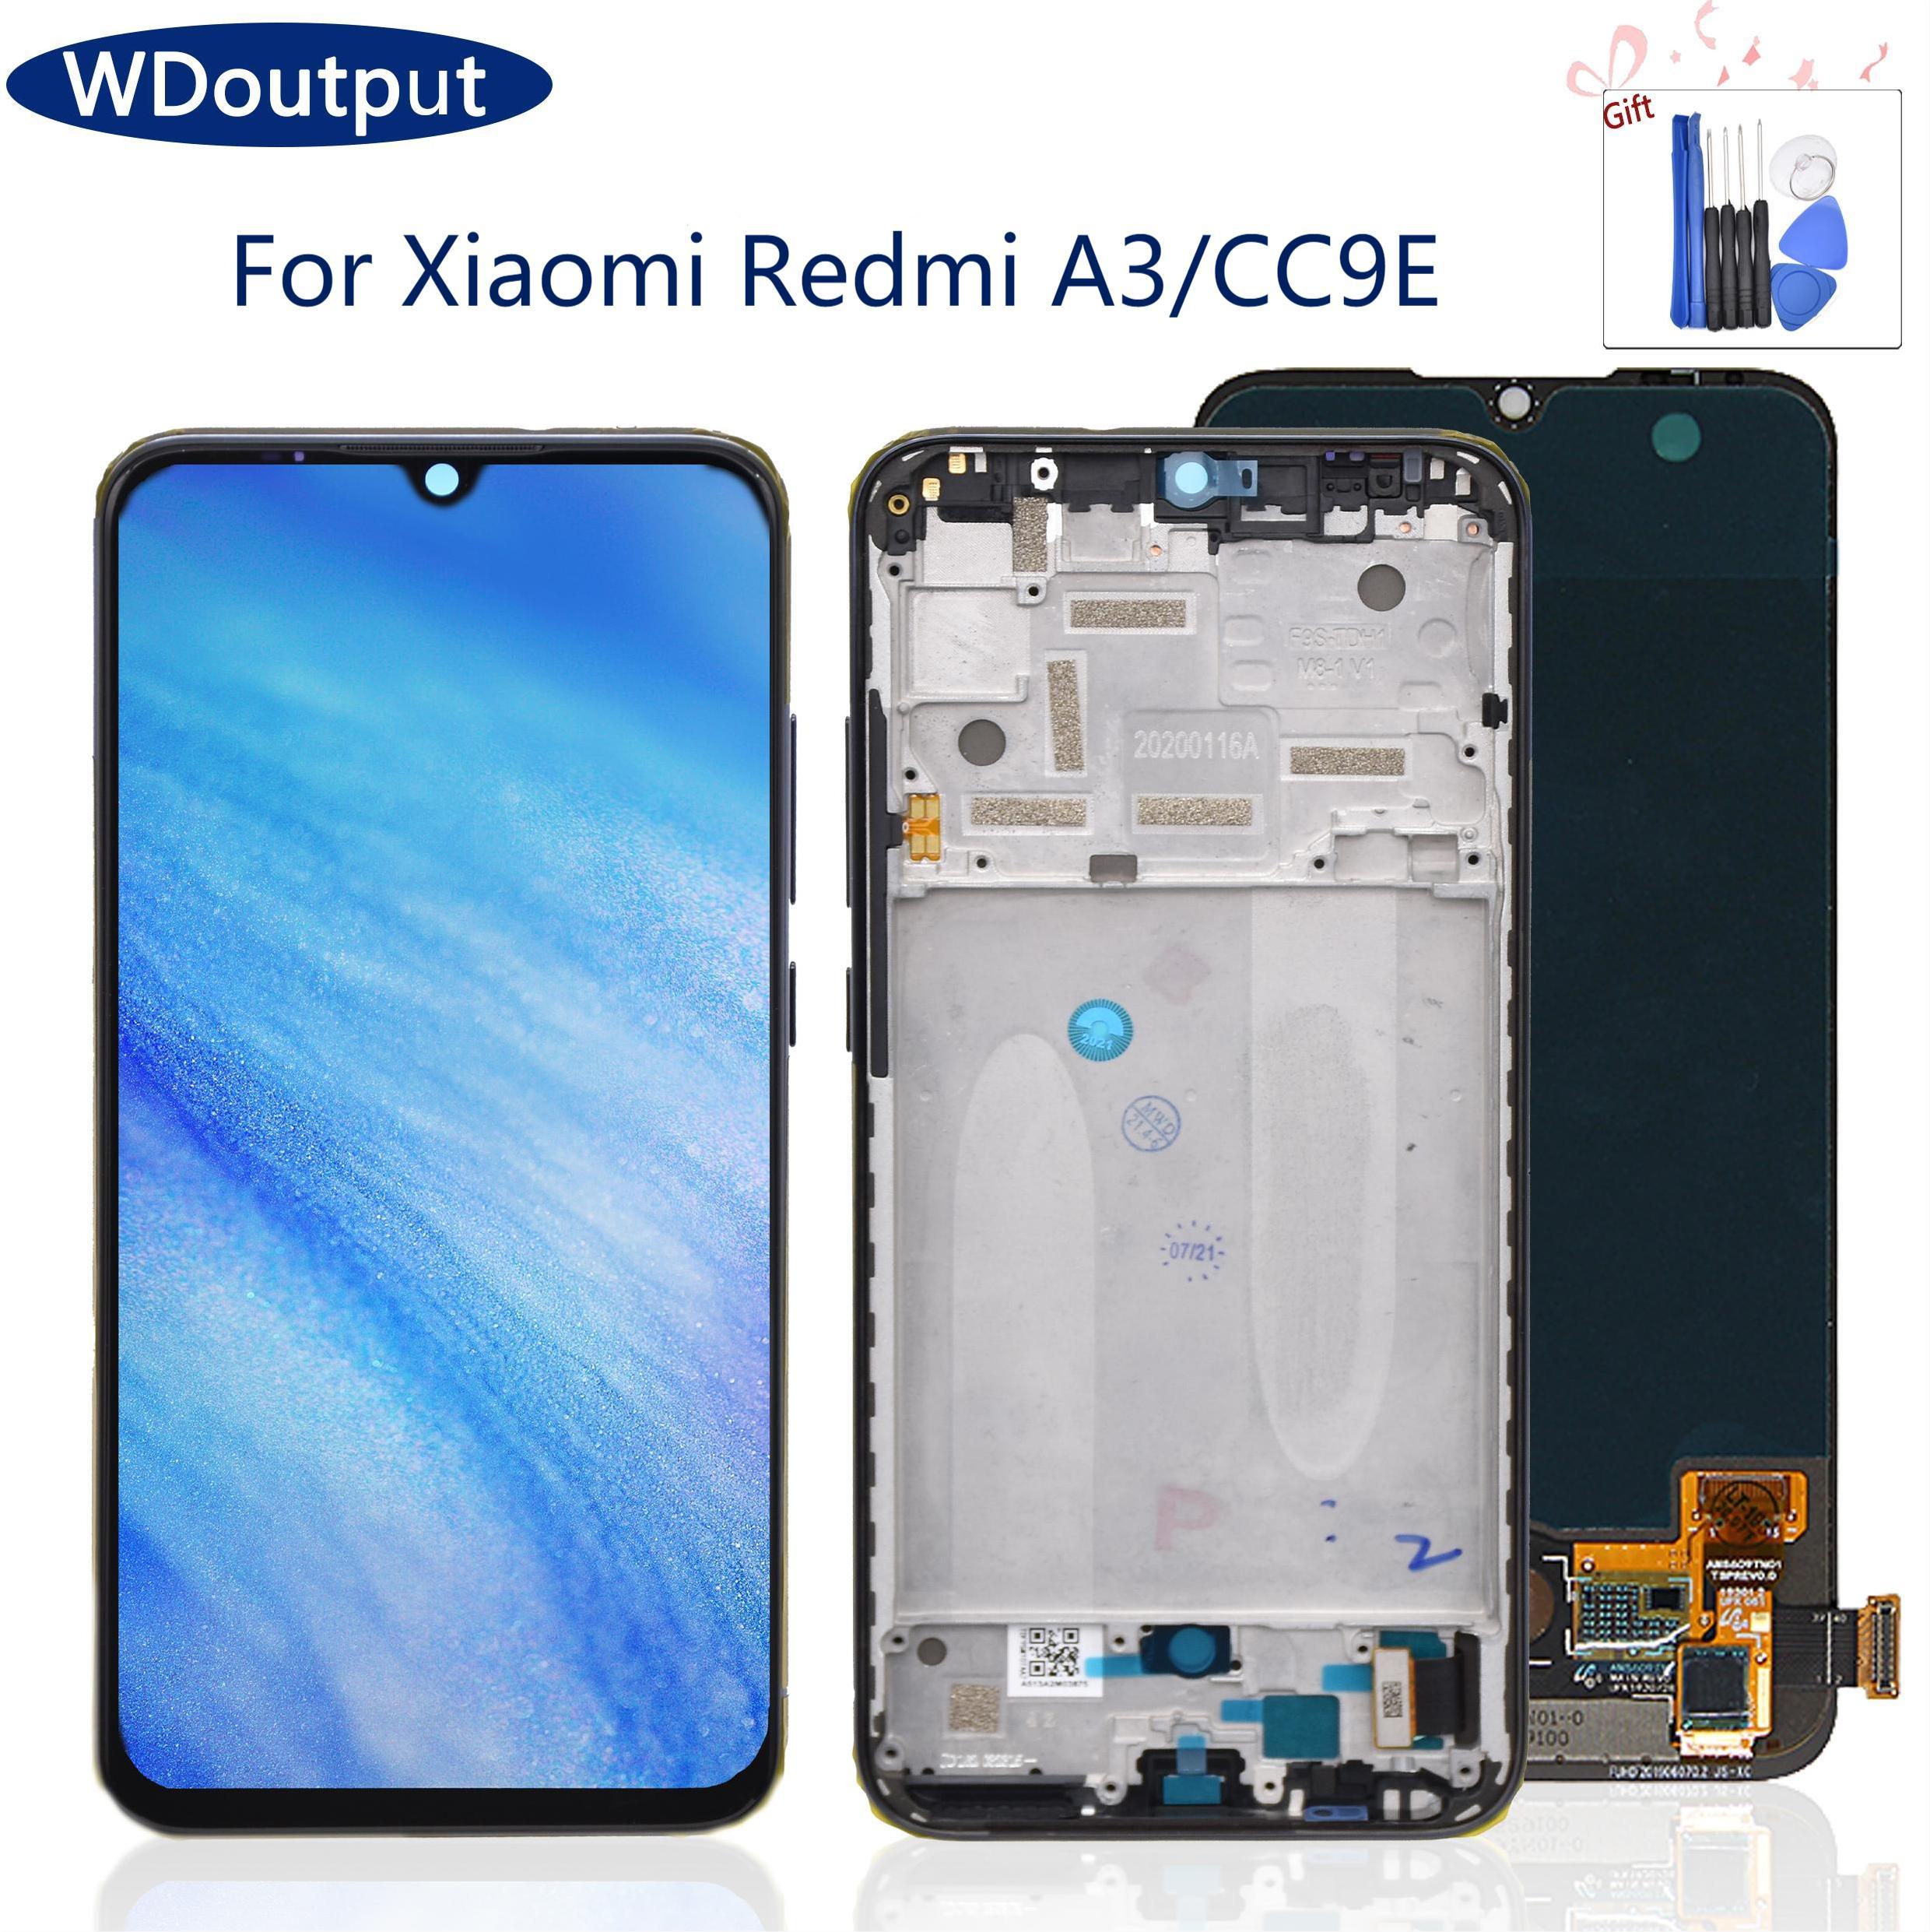 Pantalla LCD Super AMOLED para Xiaomi MI CC9E, digitalizador de pantalla táctil para Xiaomi Mi A3 LCD M1906F9SH, piezas de repuesto con marco